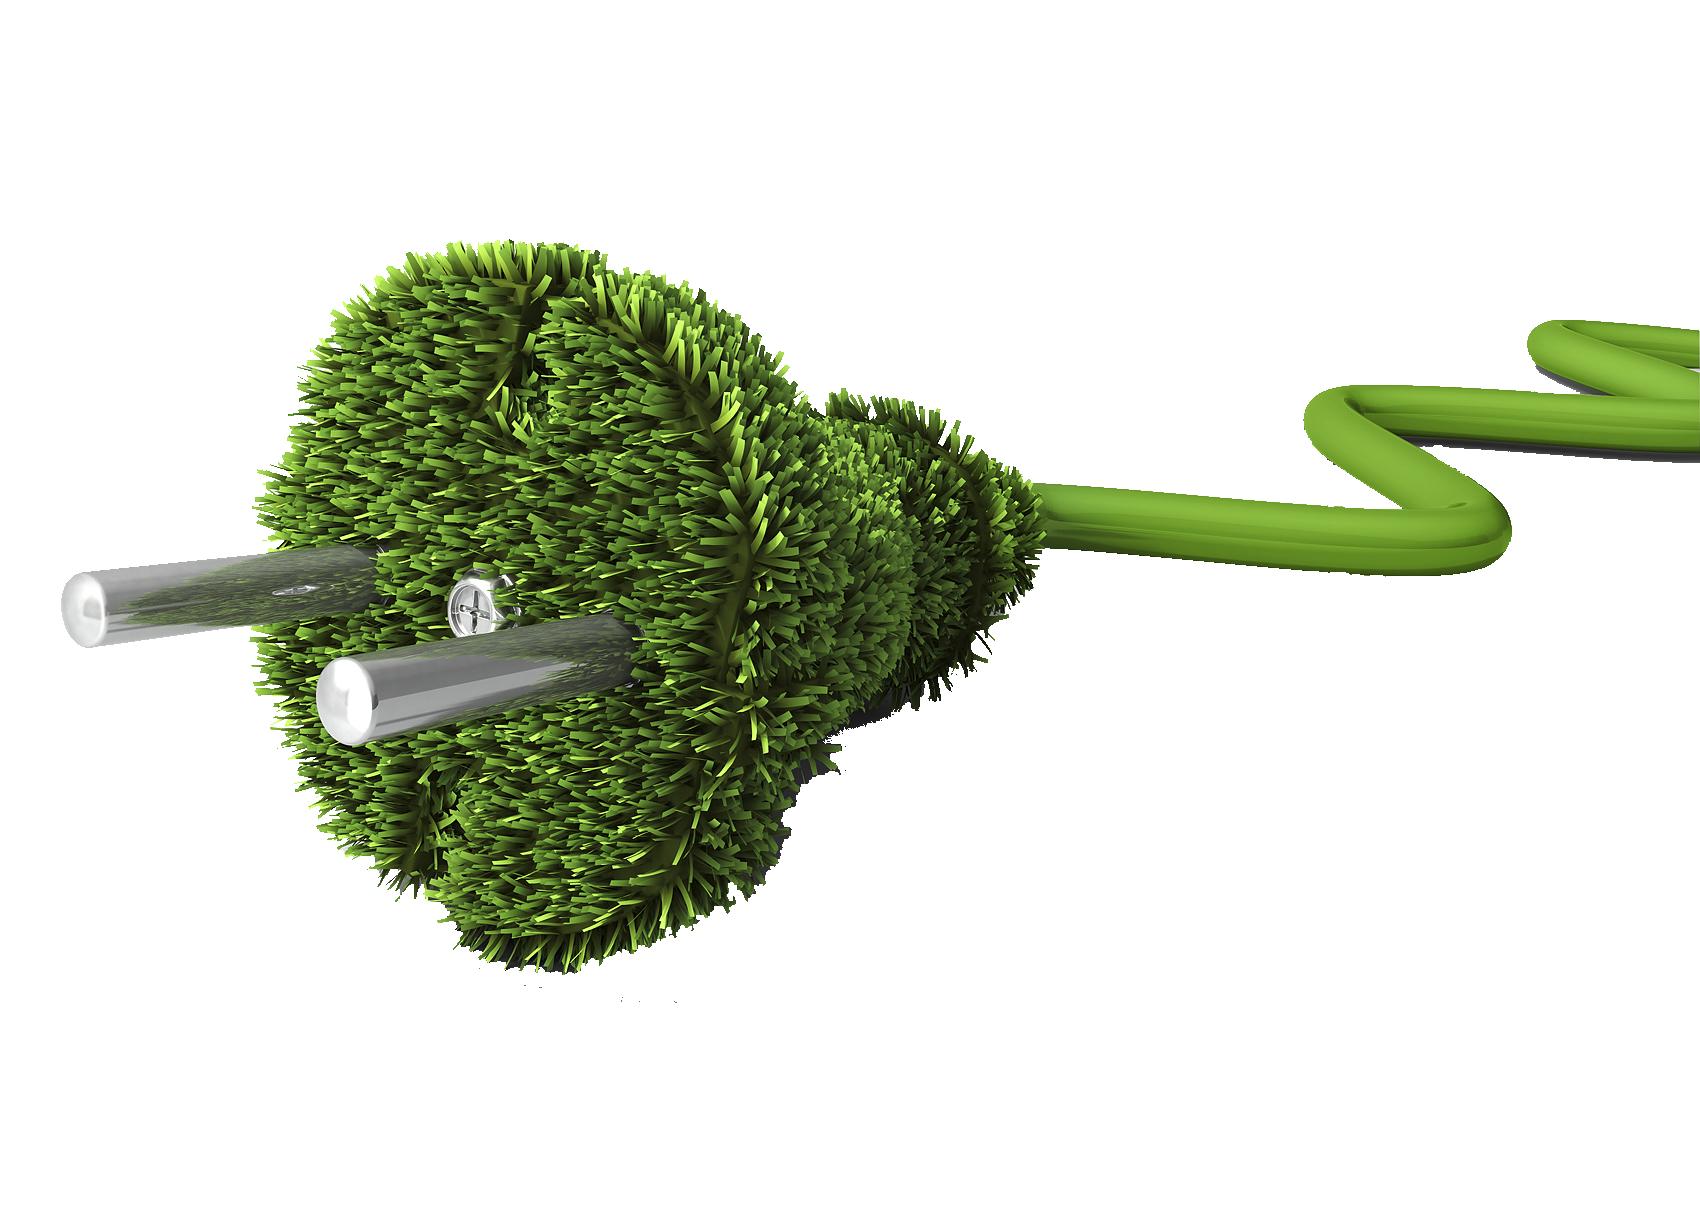 glaimpianti green energy